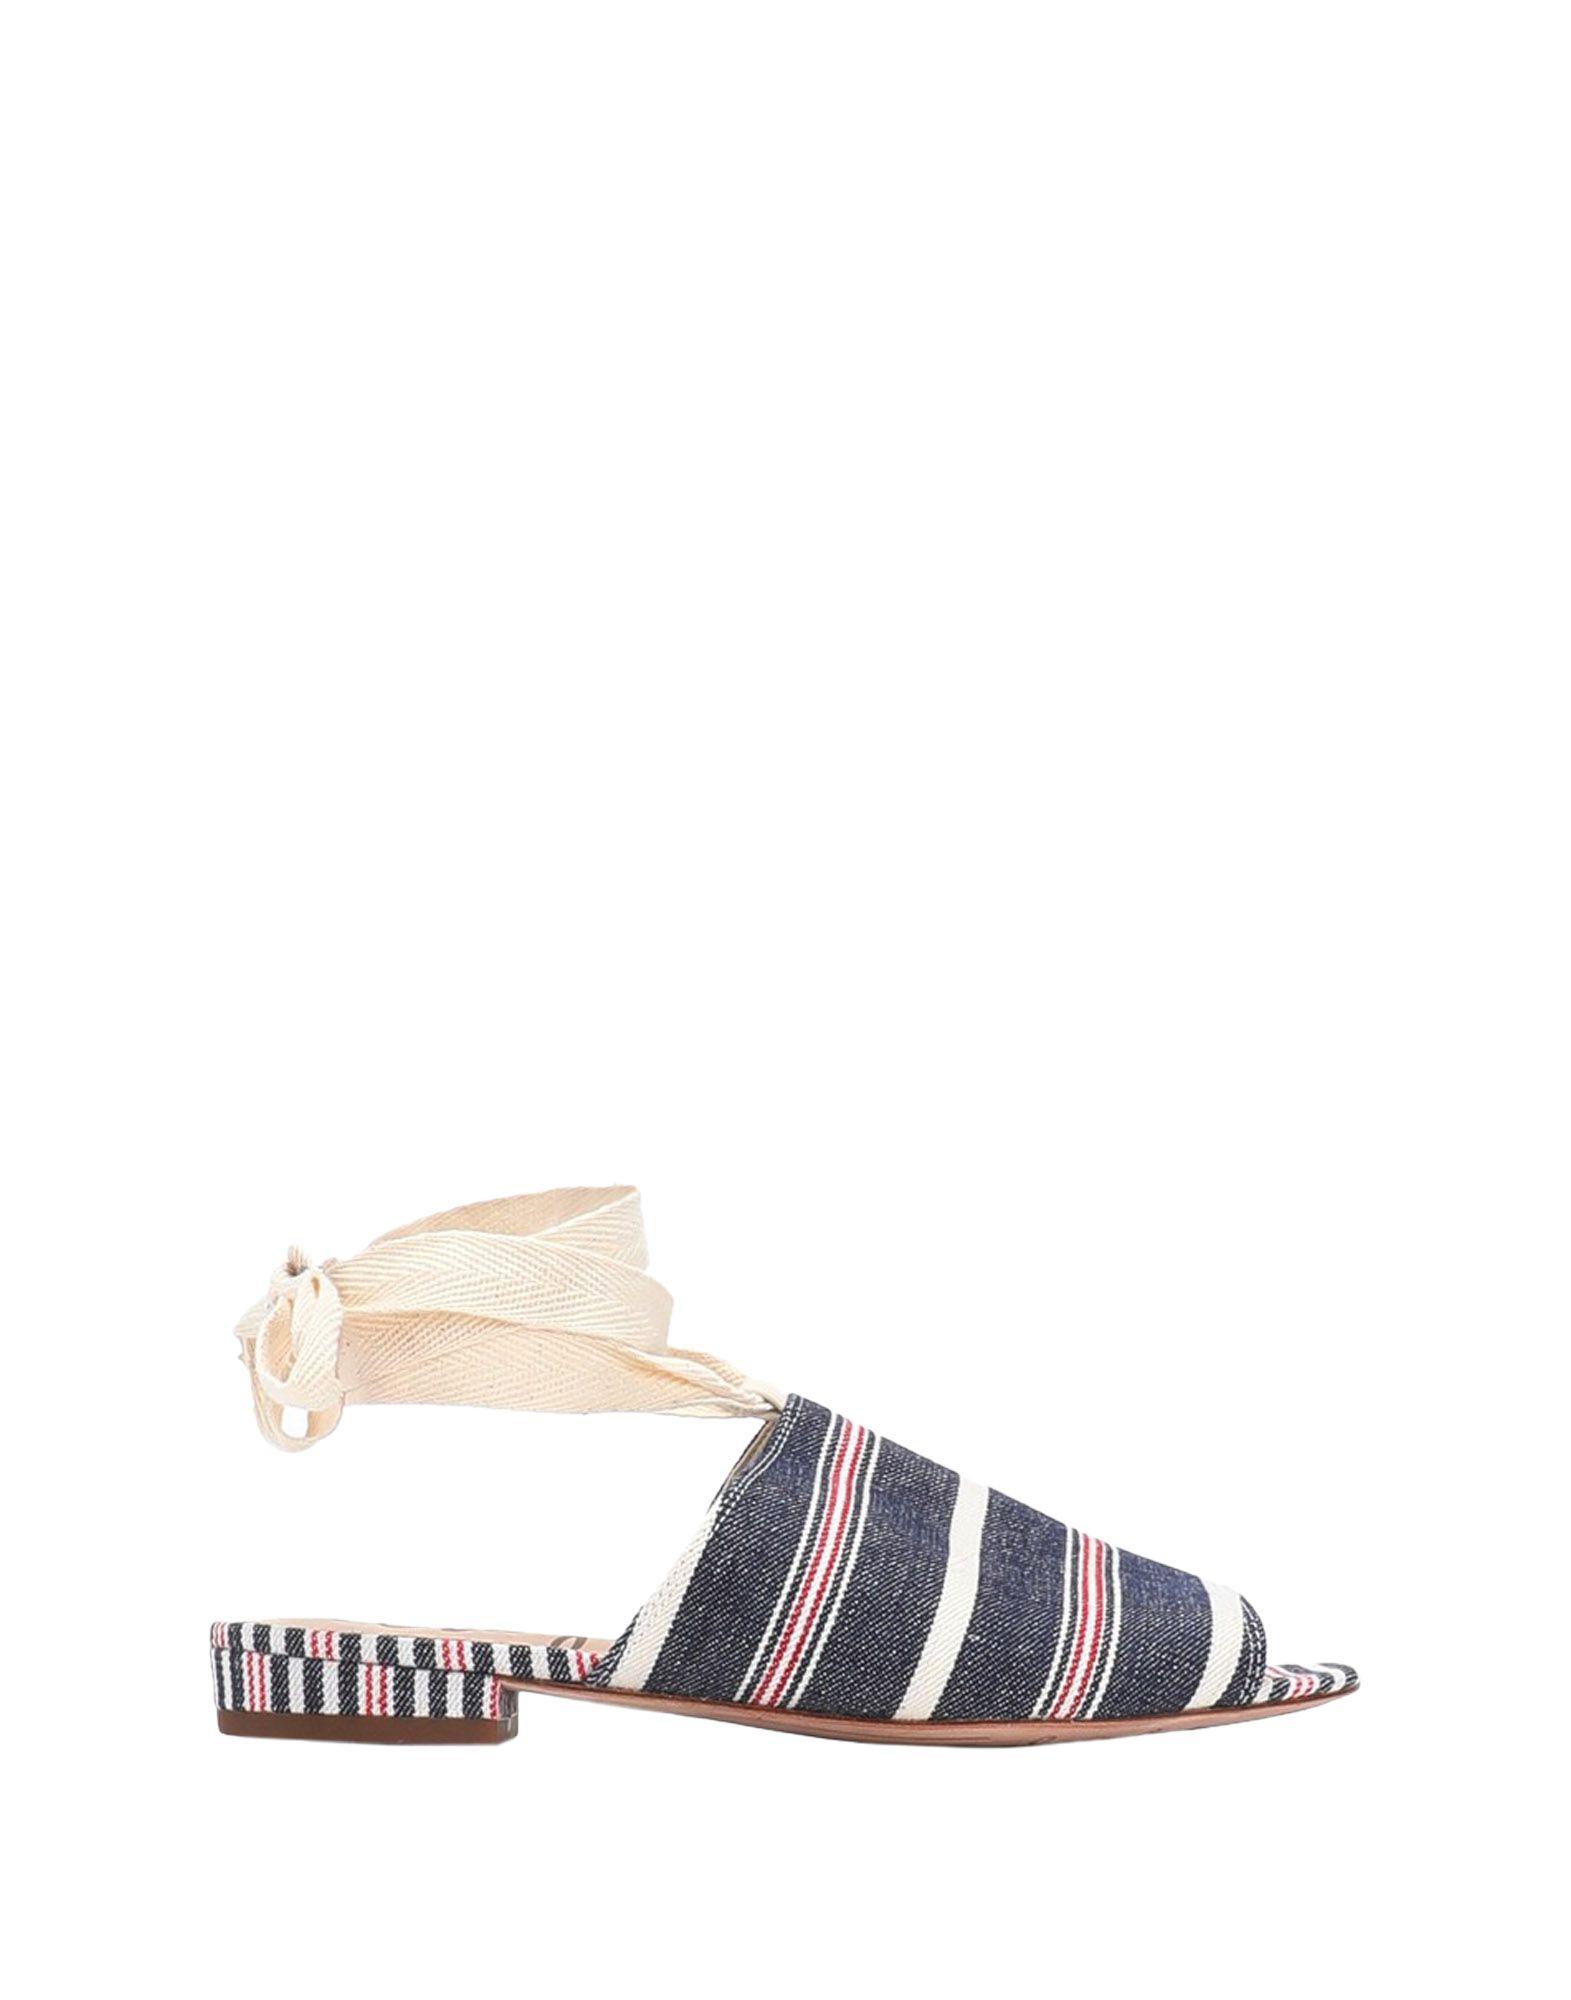 Sam Edelman Pantoletten Qualität Damen  11453857MR Gute Qualität Pantoletten beliebte Schuhe 423dee